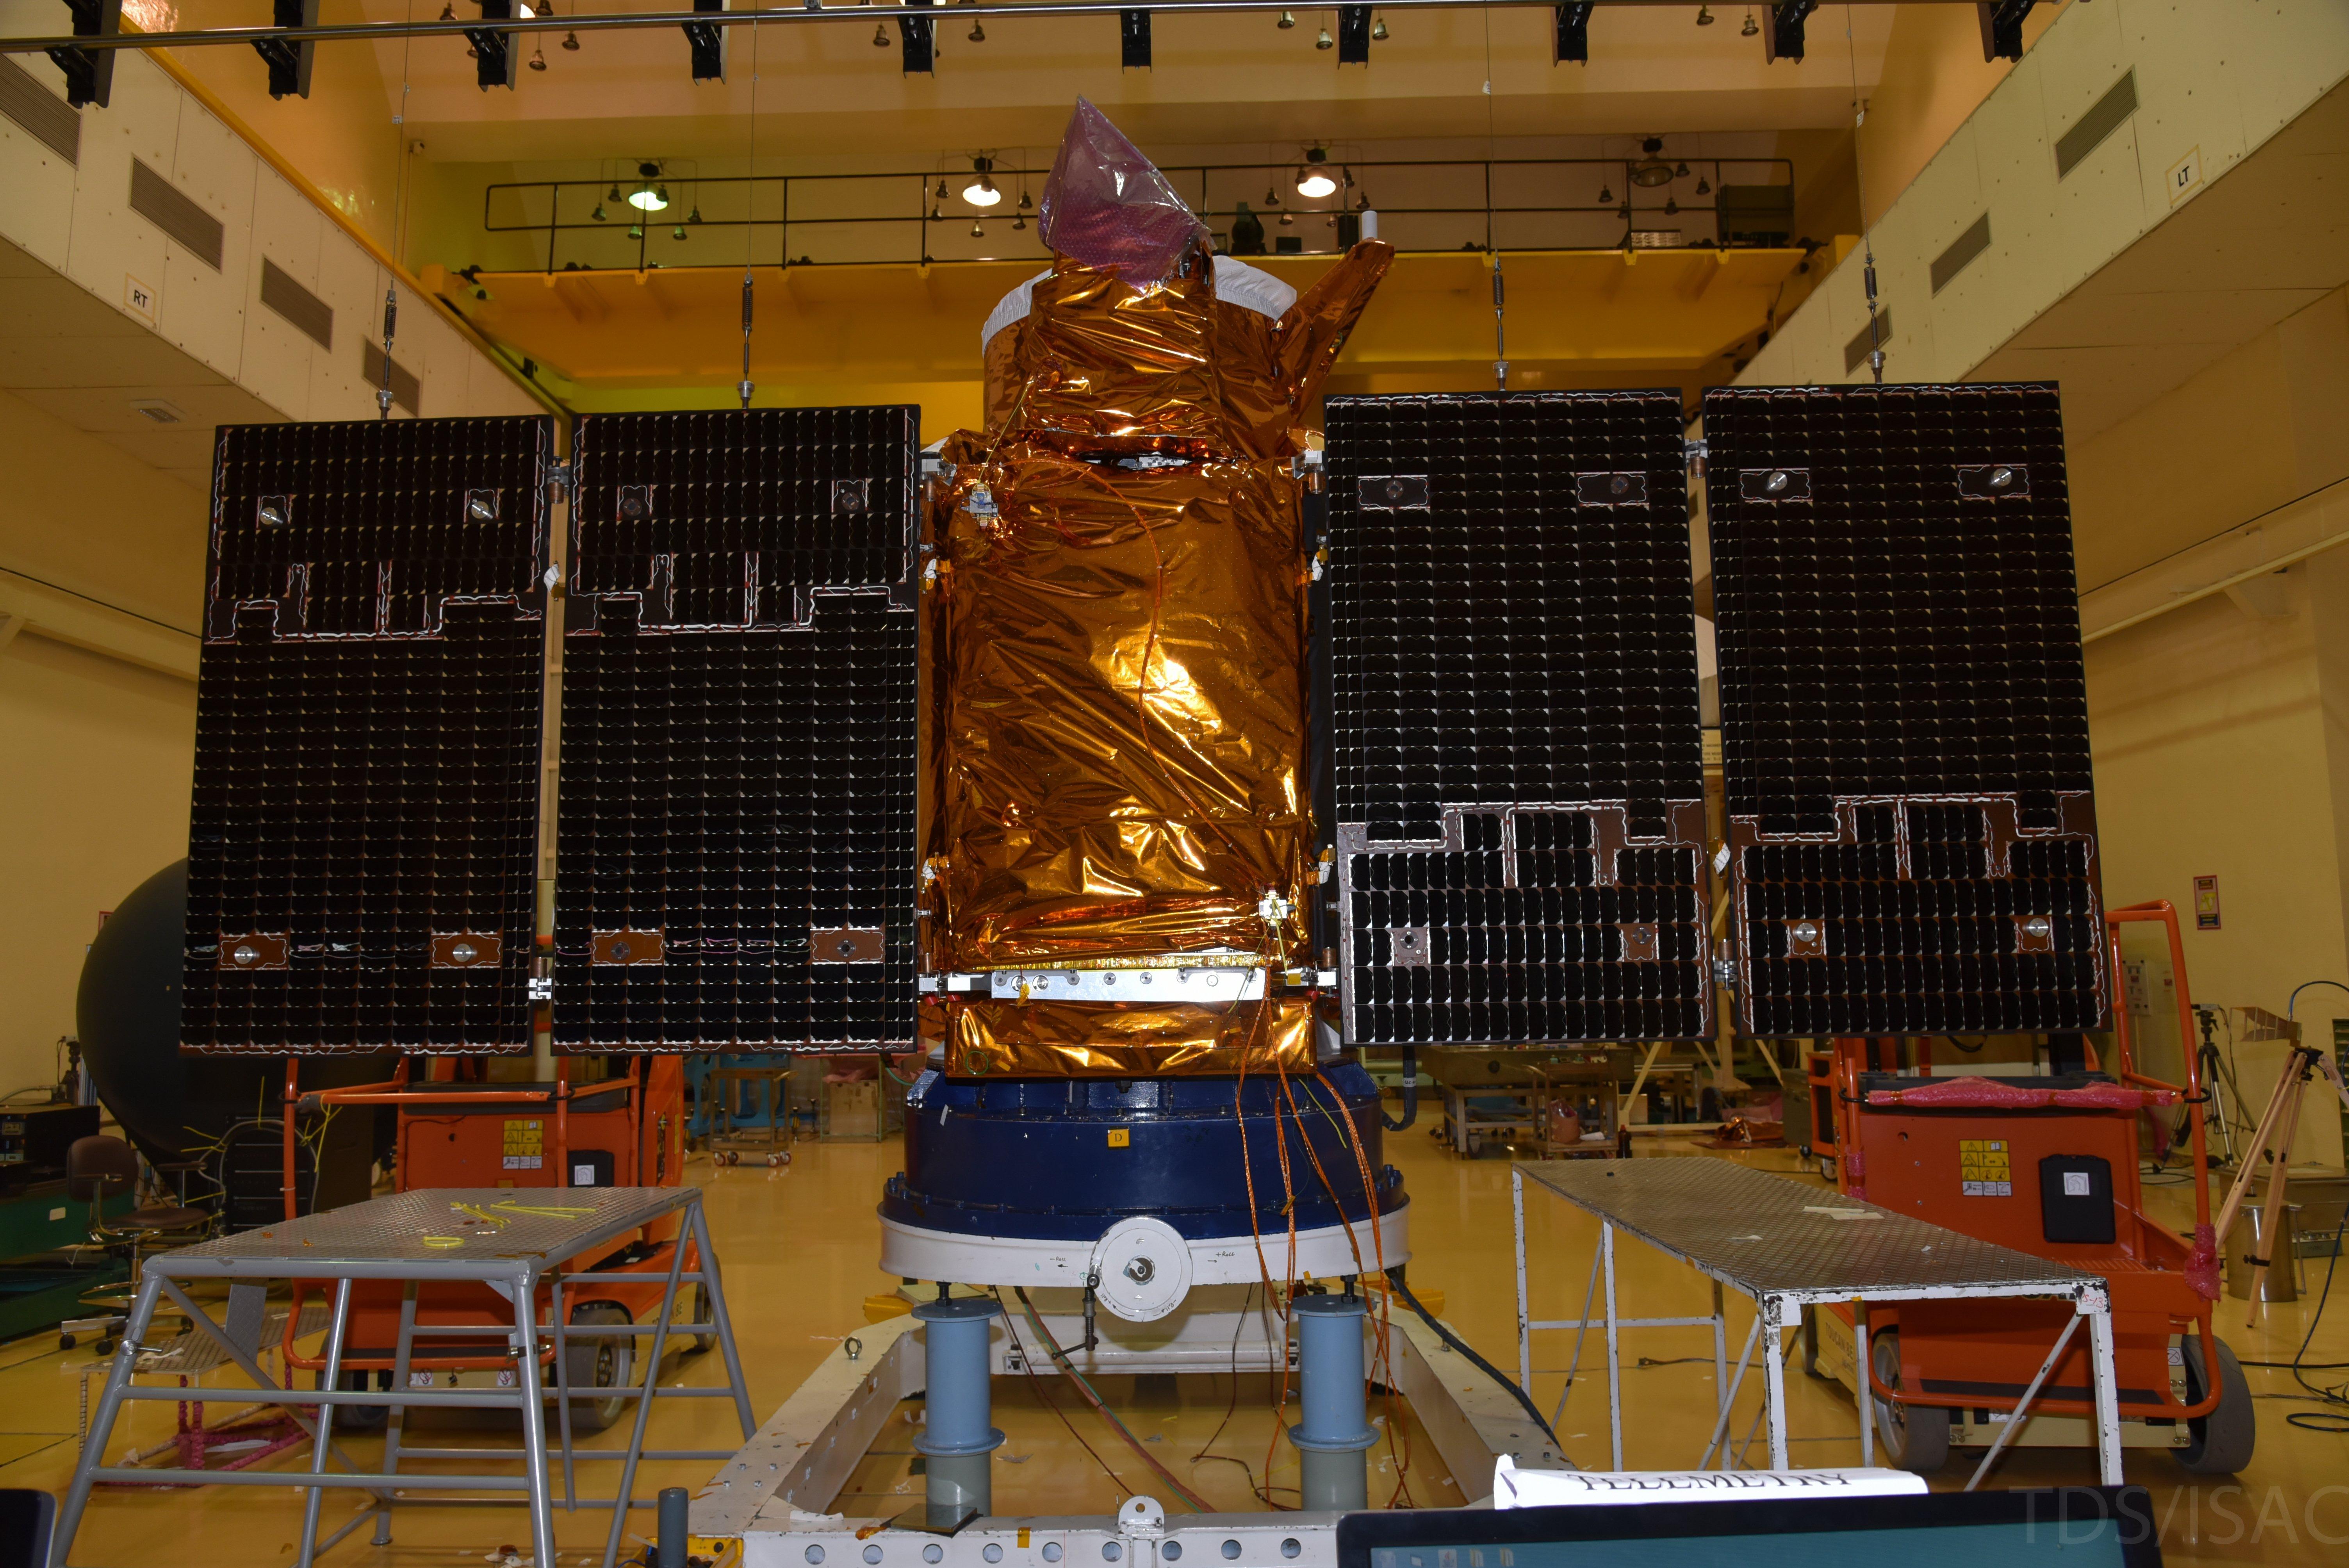 CartoSat 2F PSLV C40 Spaceflight101